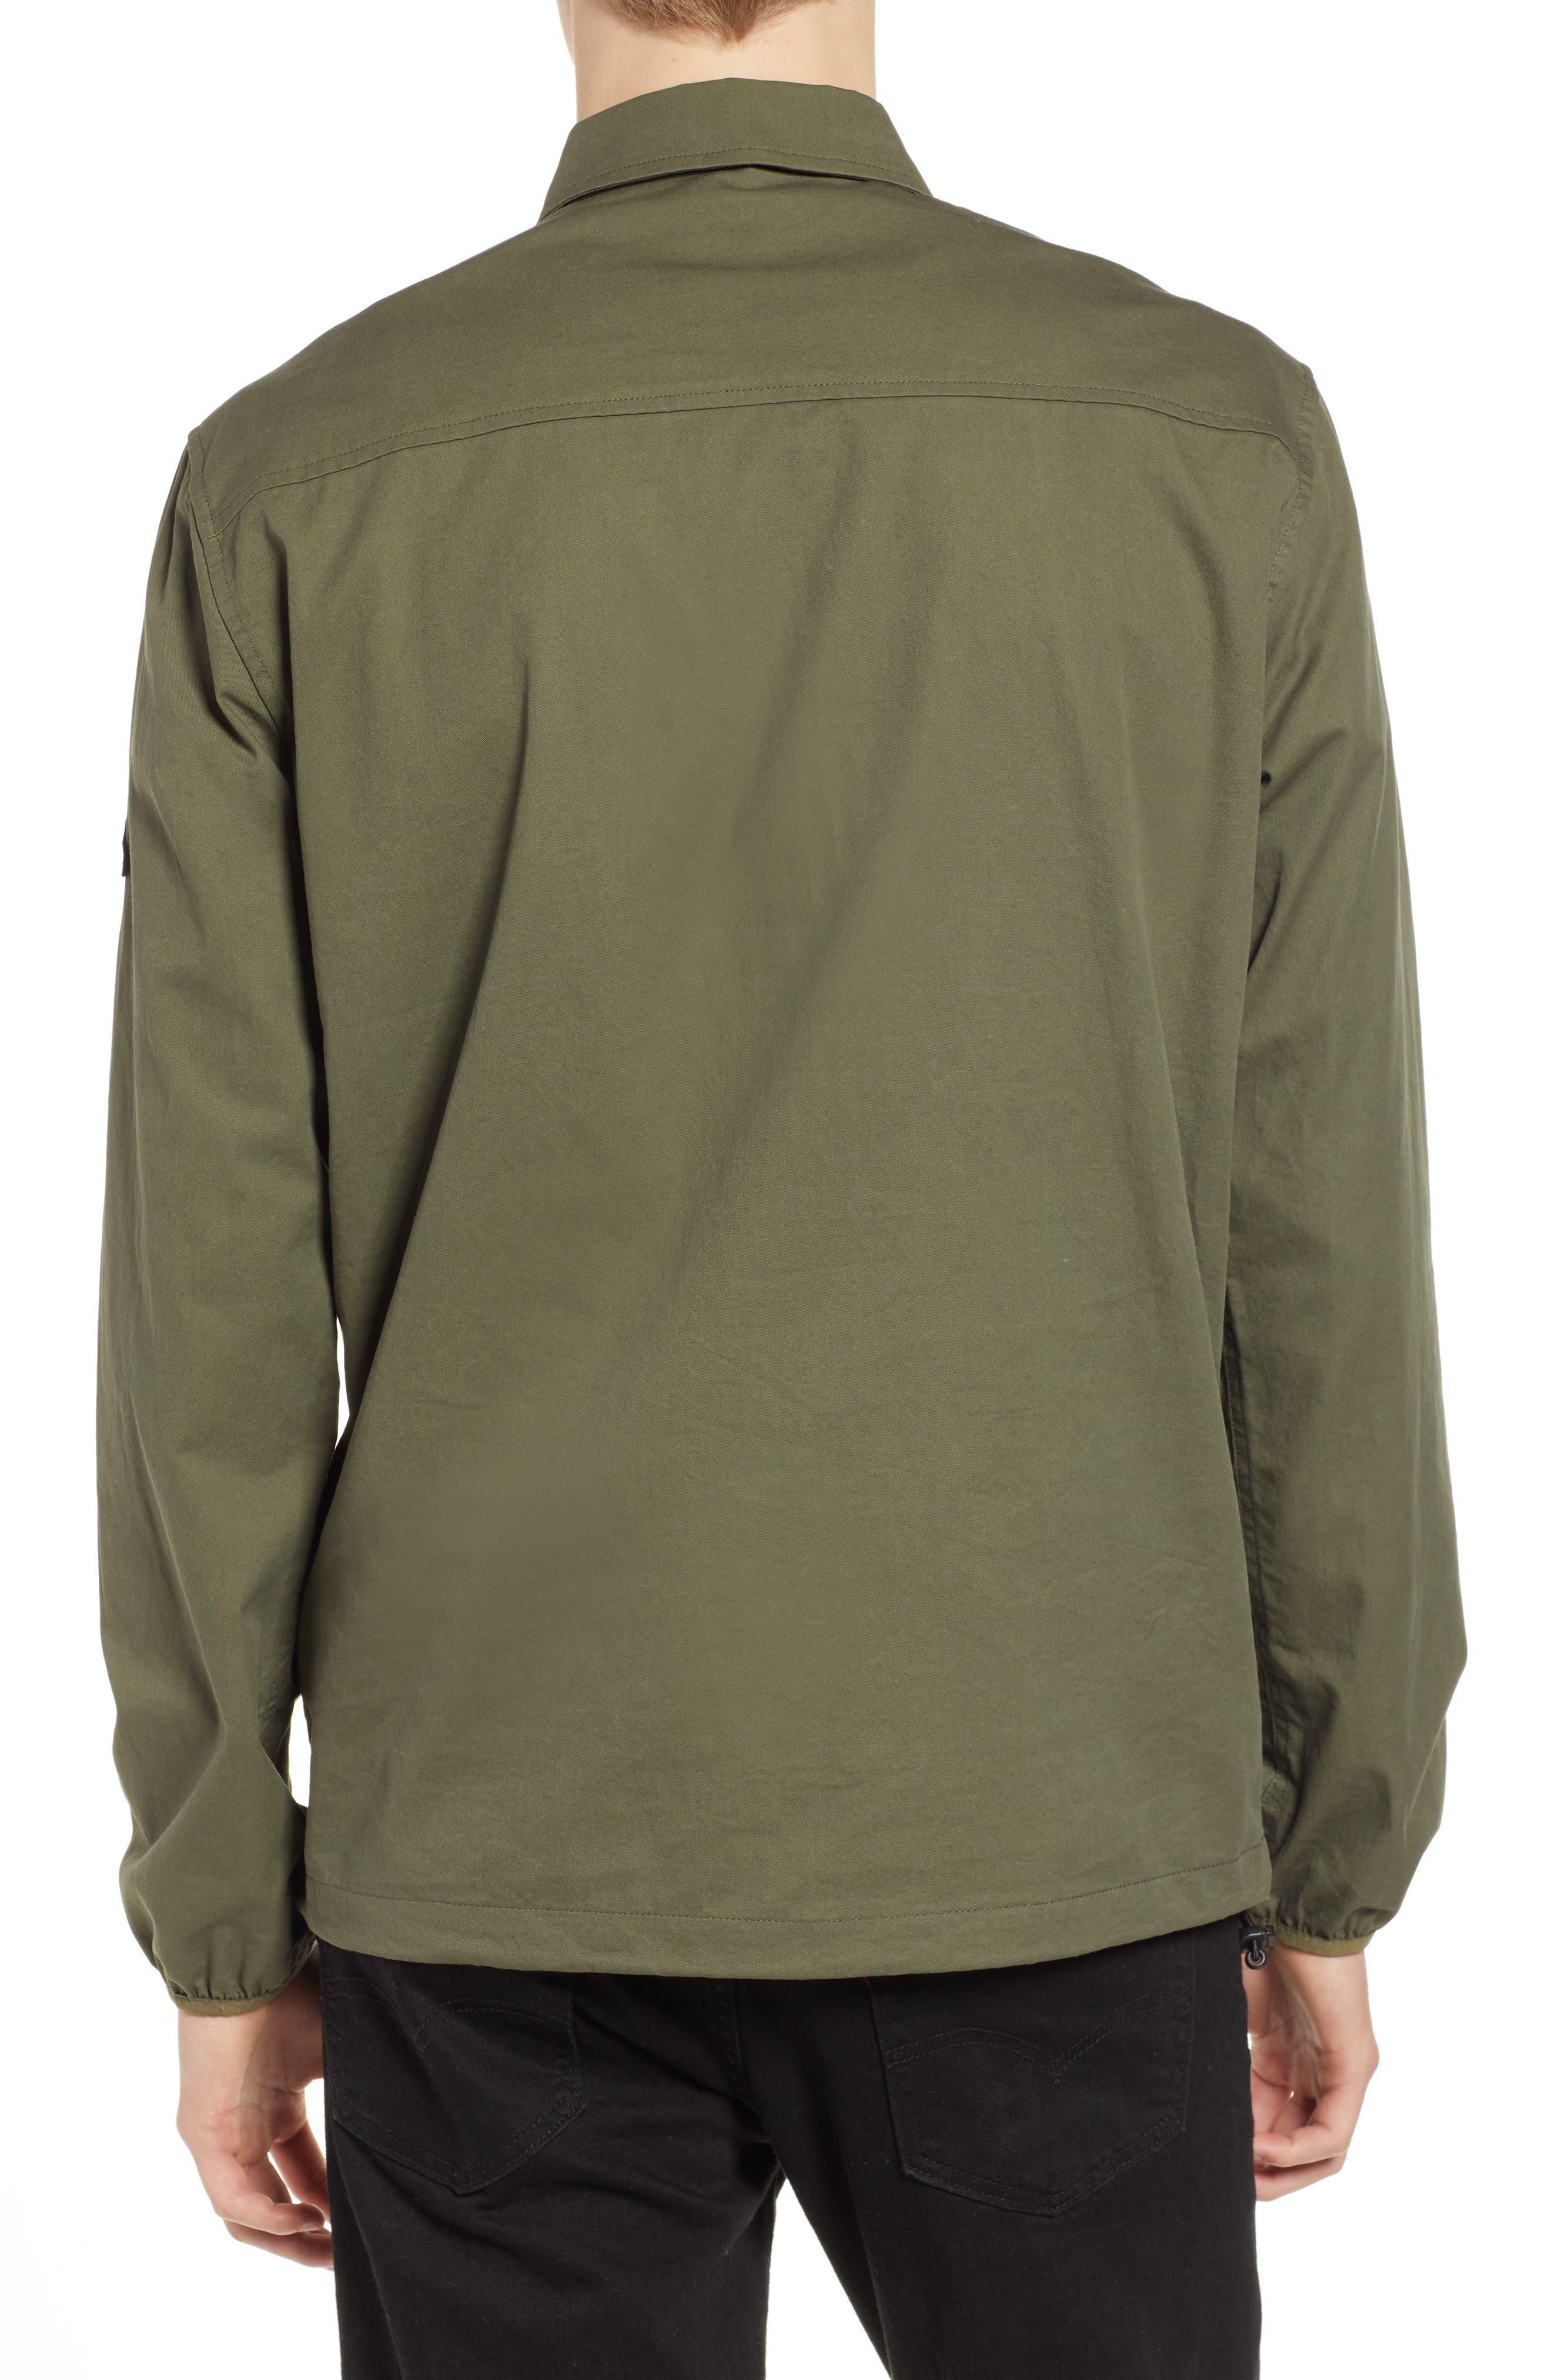 Adelanto Snap Pocket Shirt,                             Alternate thumbnail 2, color,                             DARK OLIVE